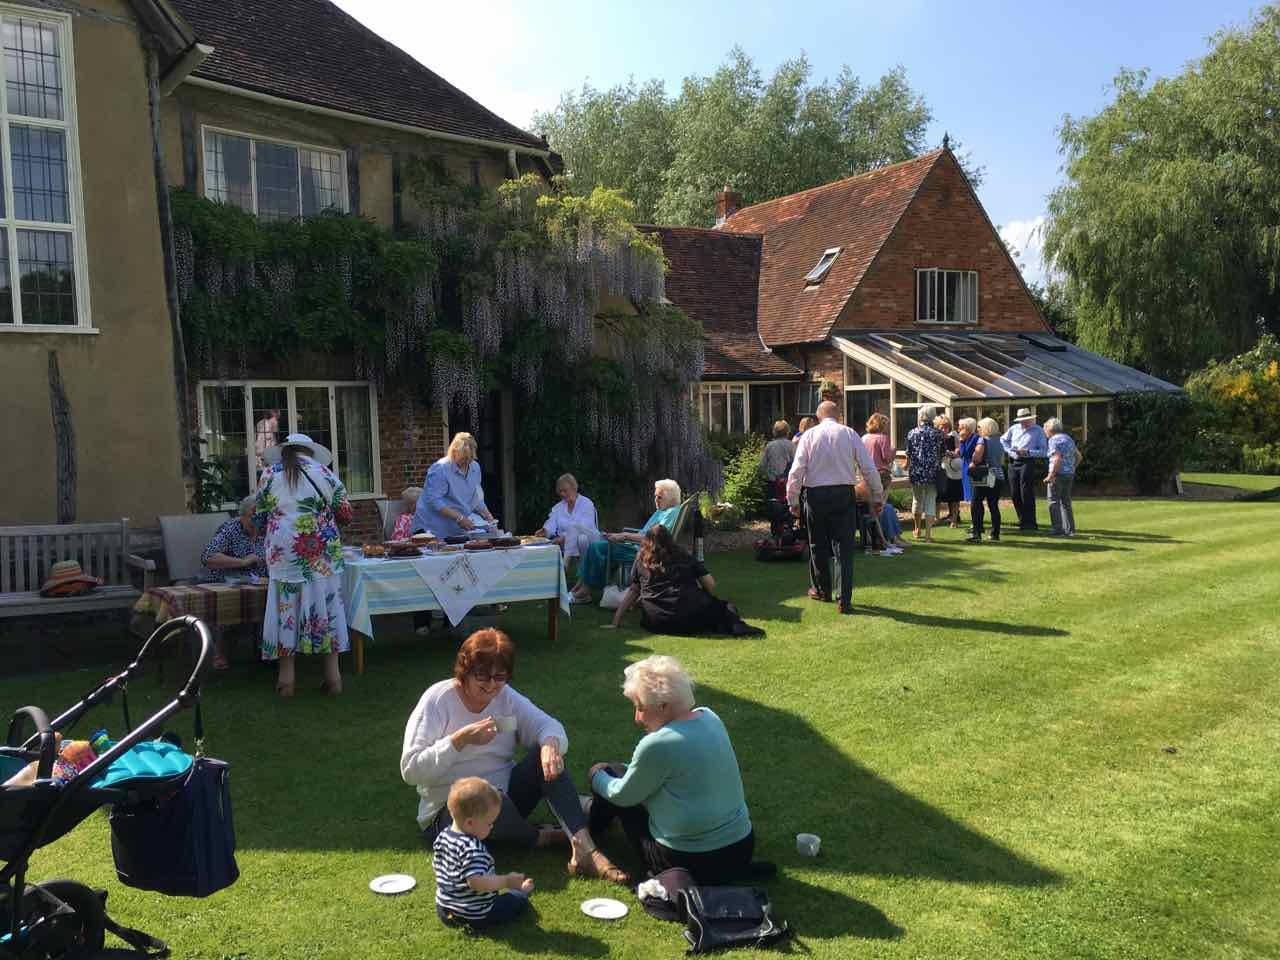 Tea Party at Maydencroft Manor